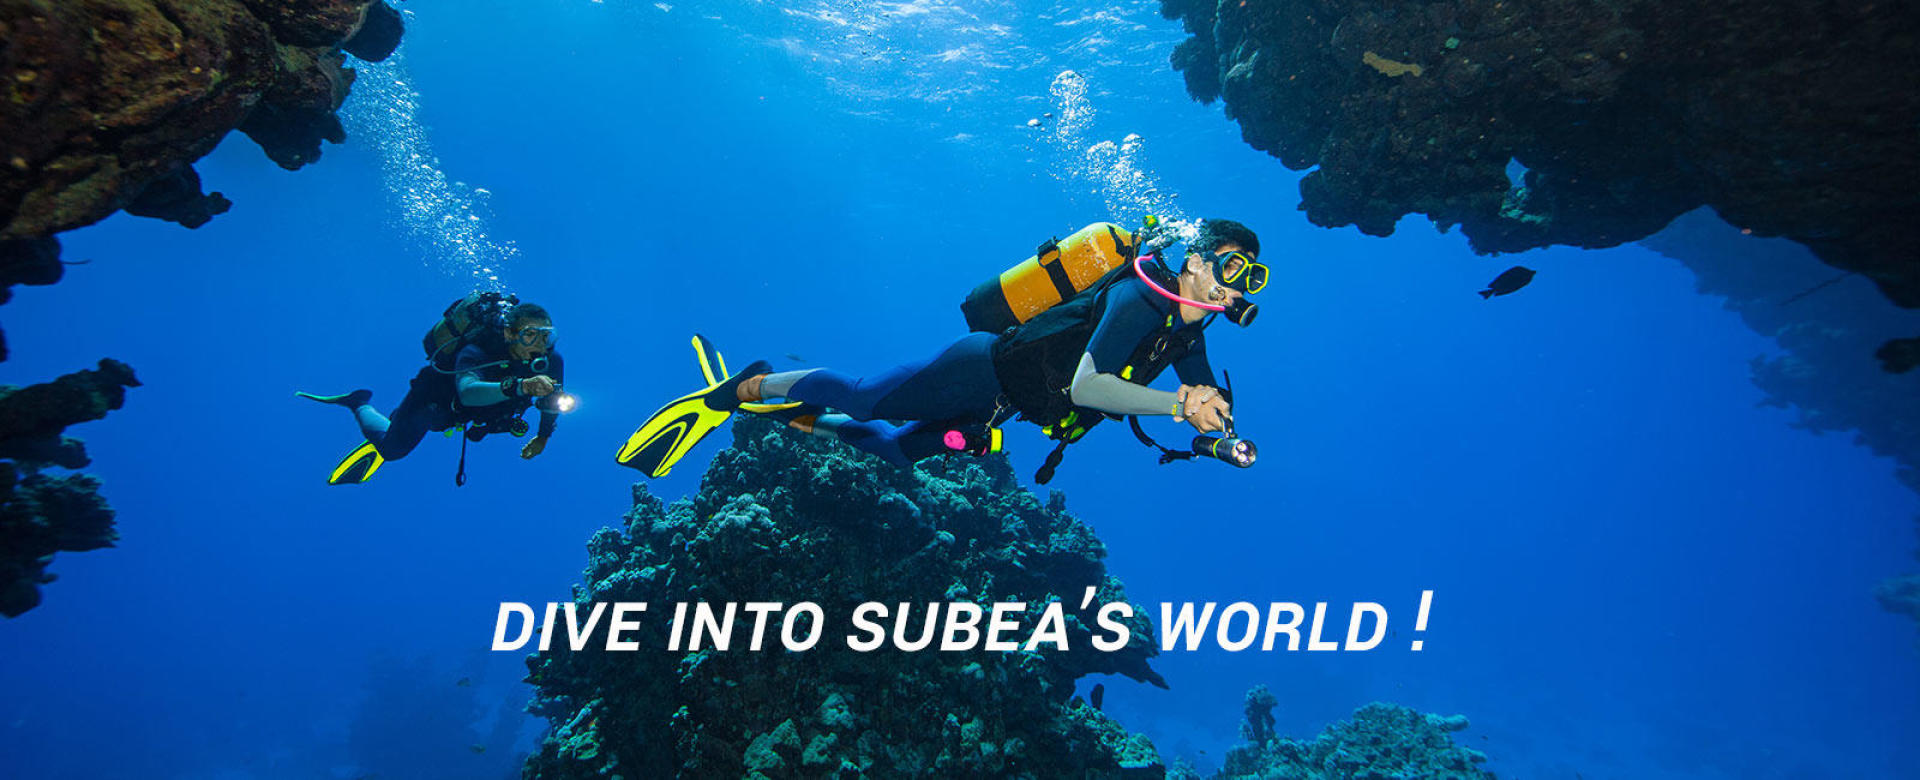 scuba diving subea